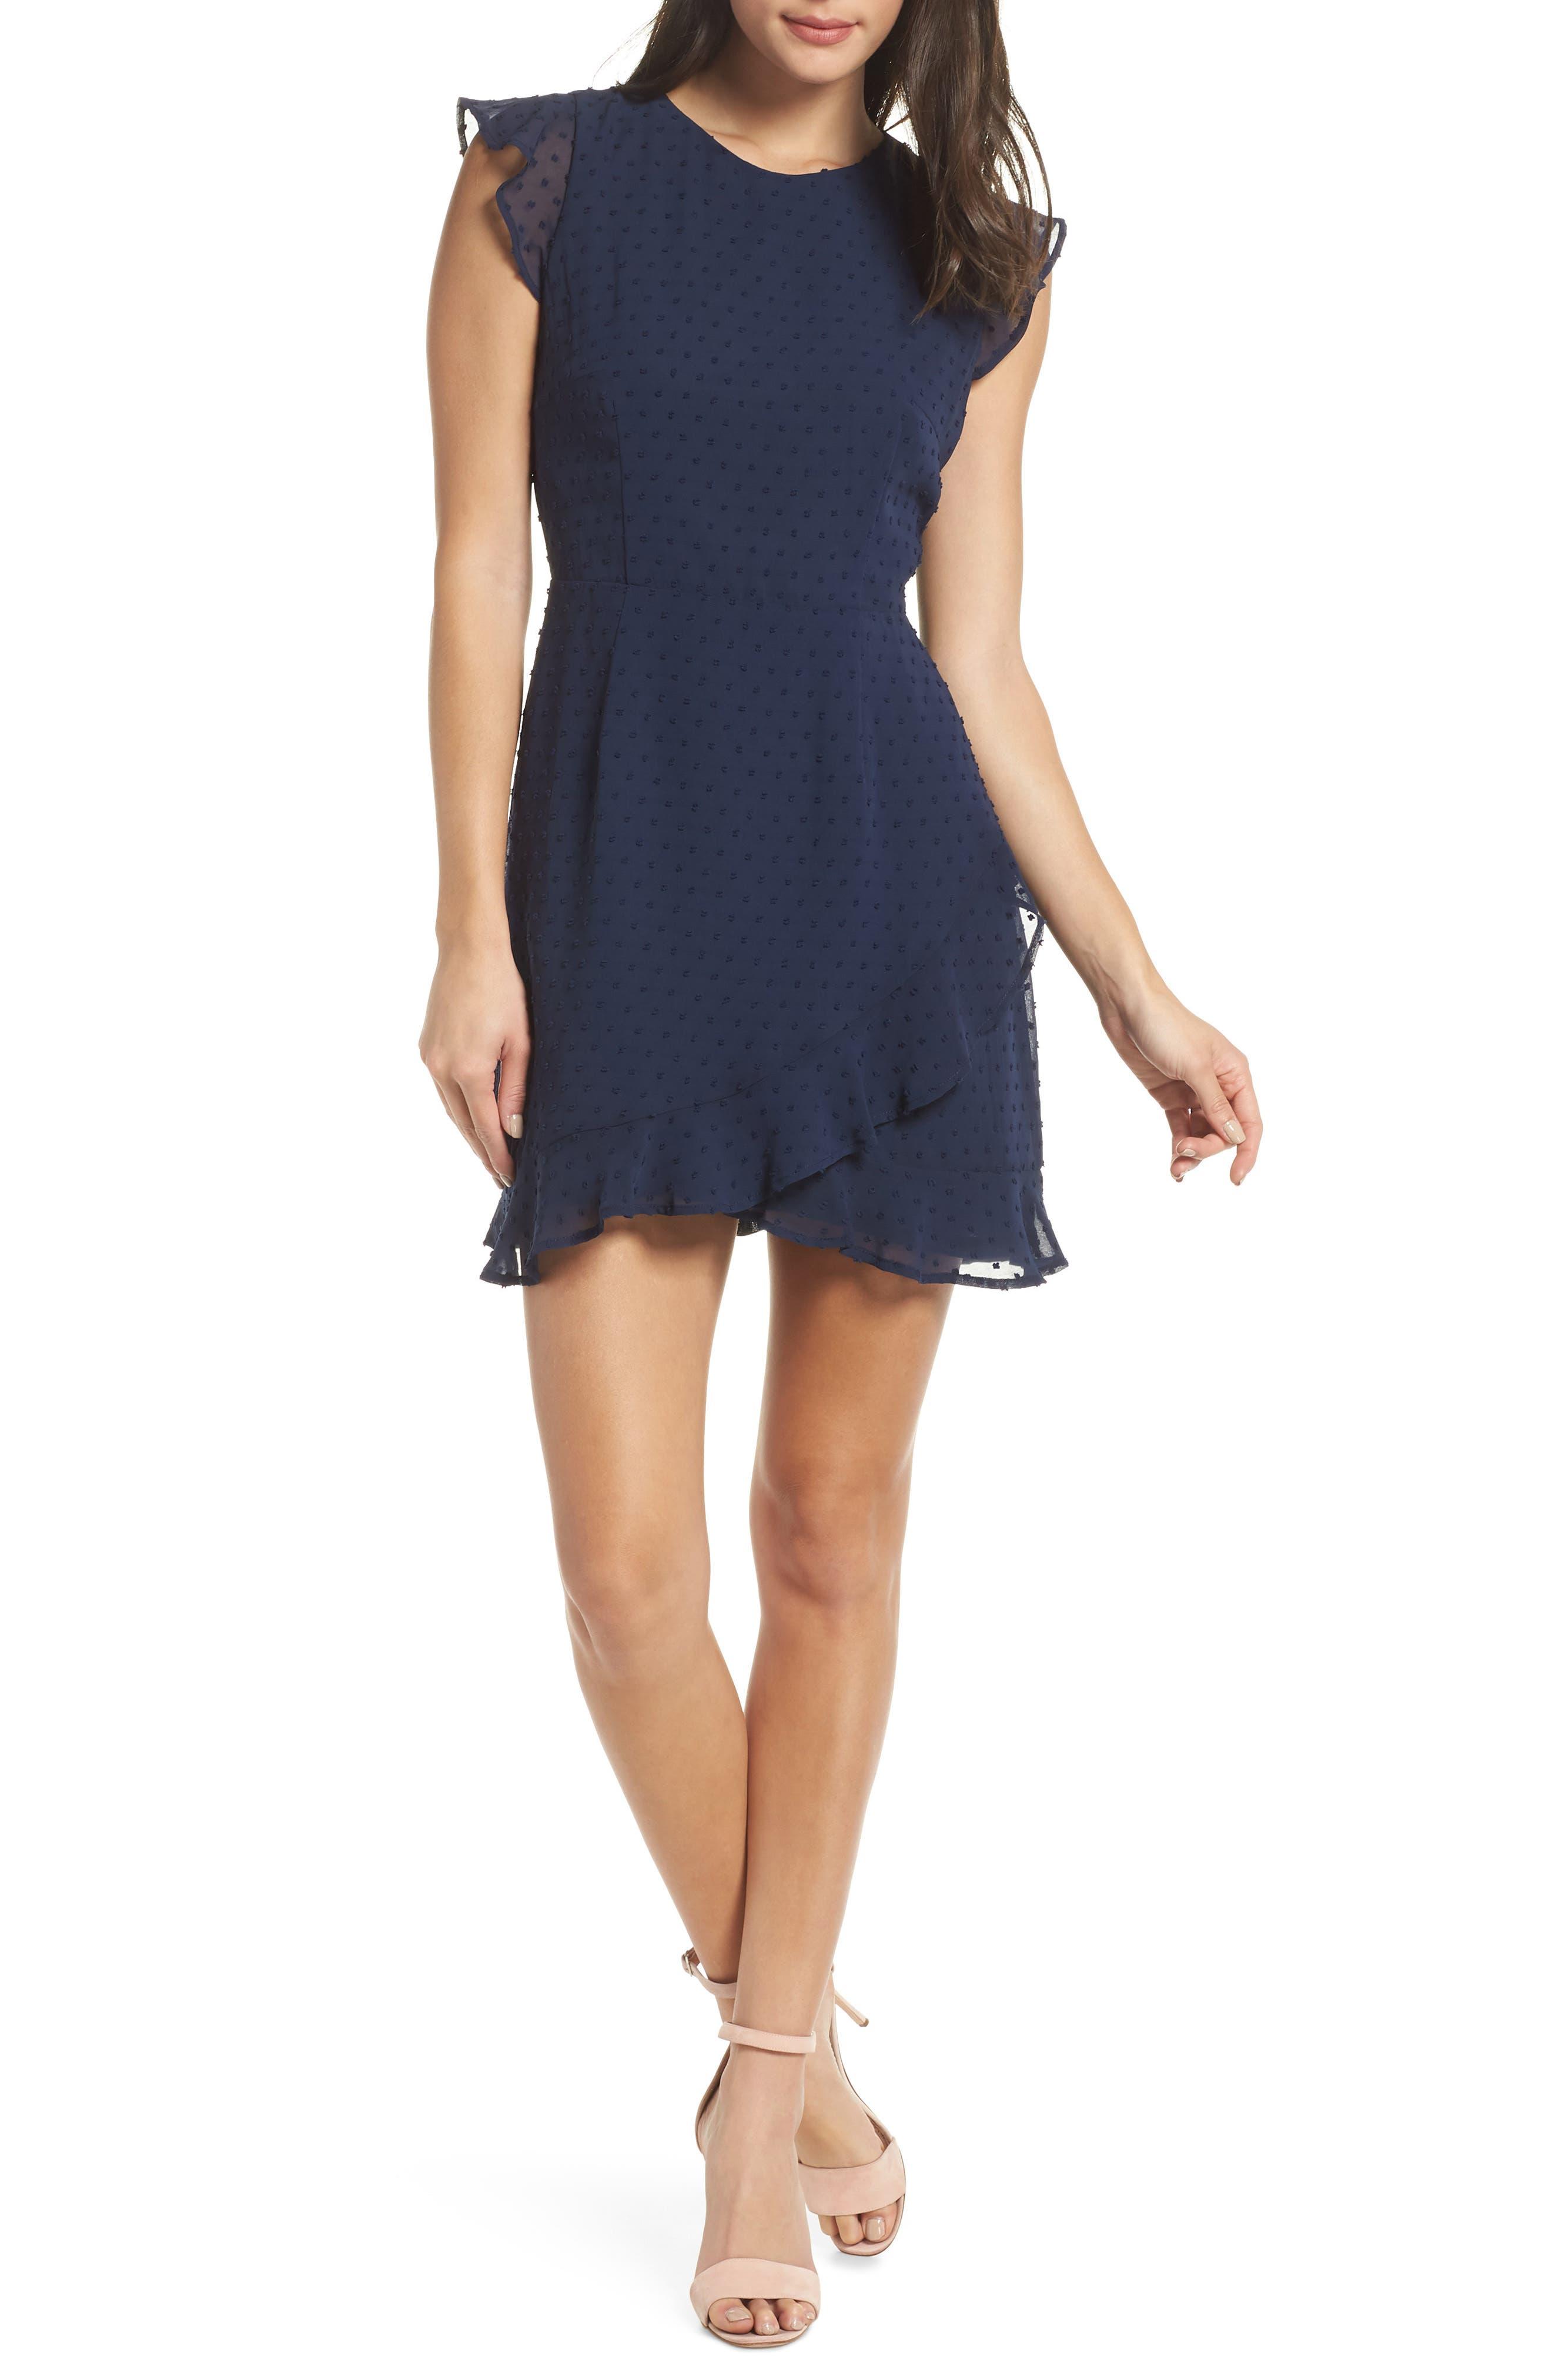 19 COOPER Swiss Dot Ruffle Dress, Main, color, 410